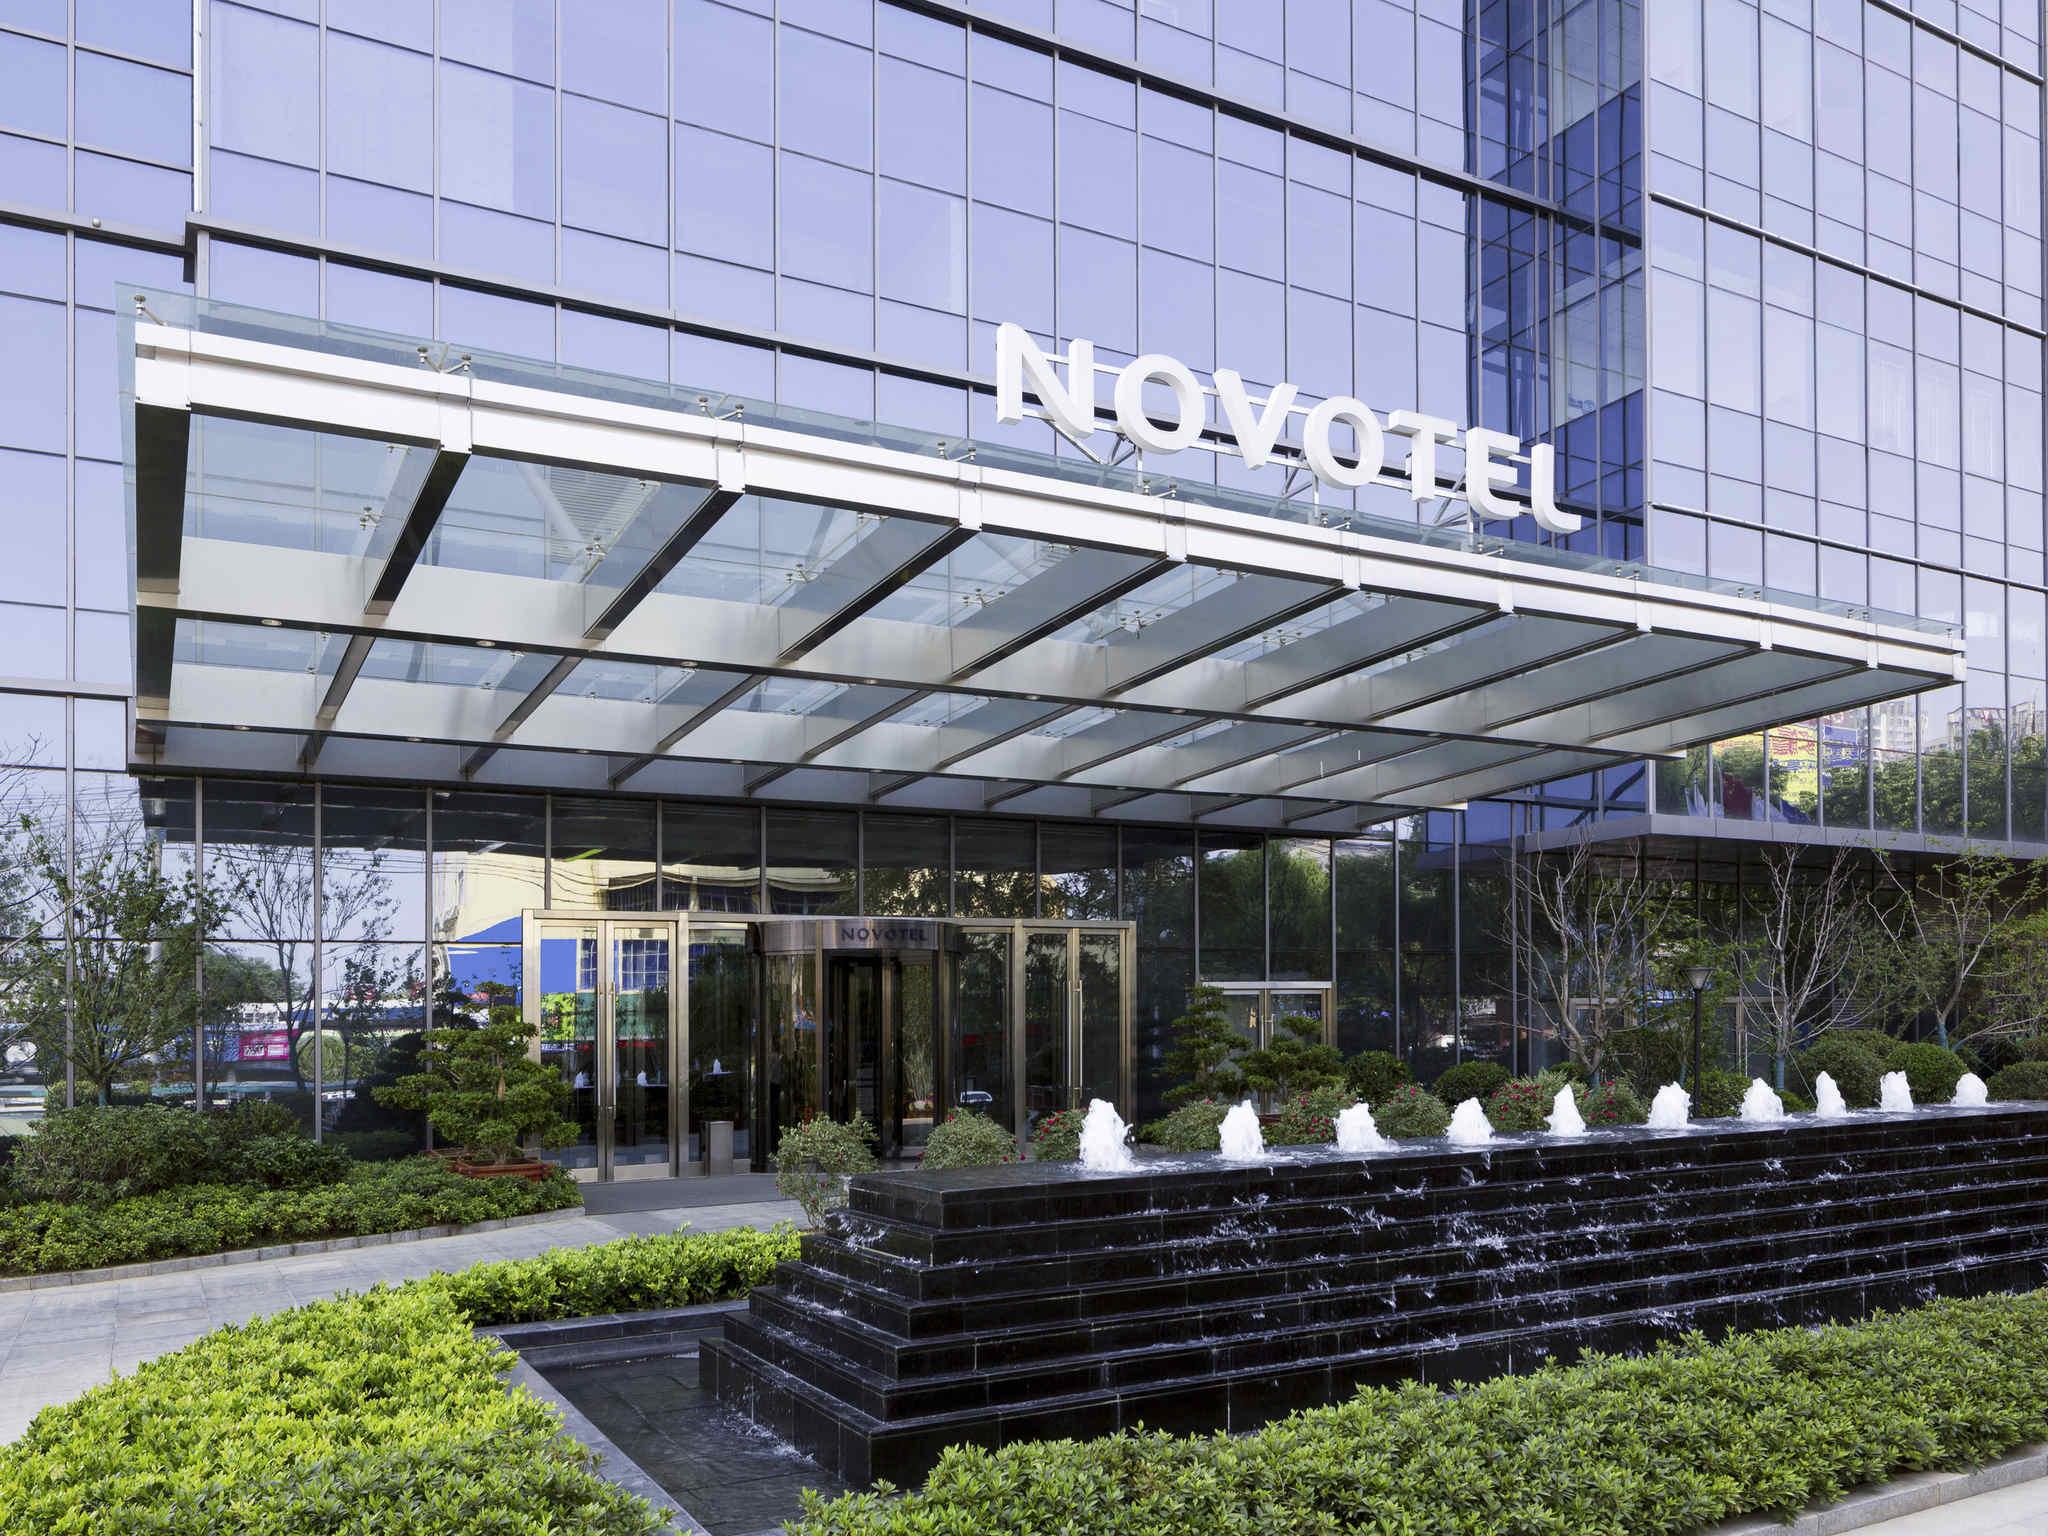 Hôtel - Novotel Rizhao Suning